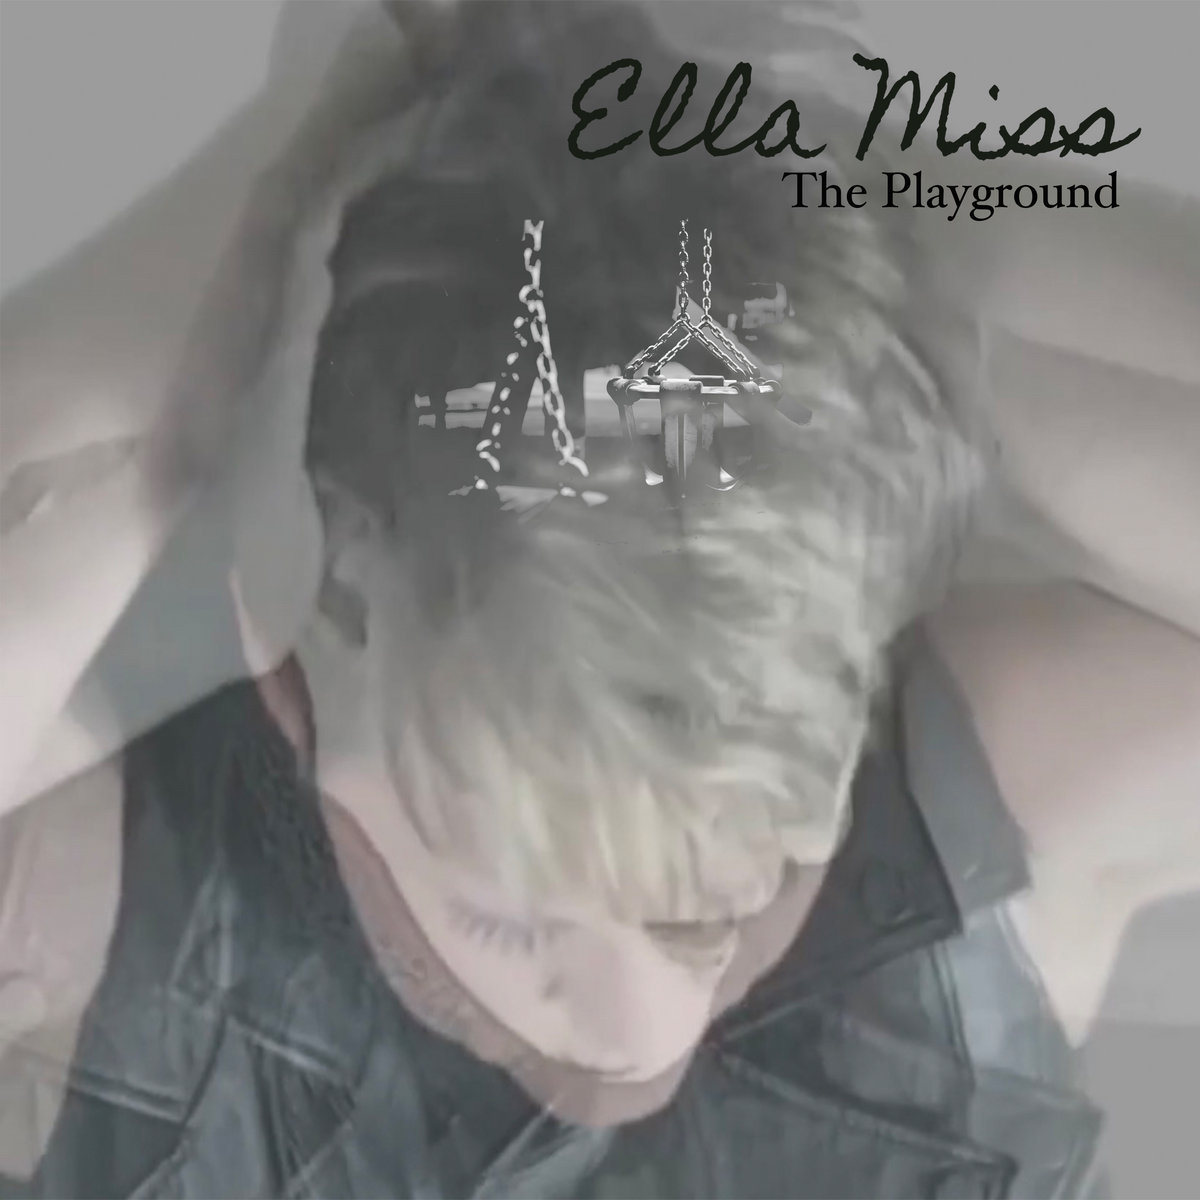 The Playground by Ella Miss